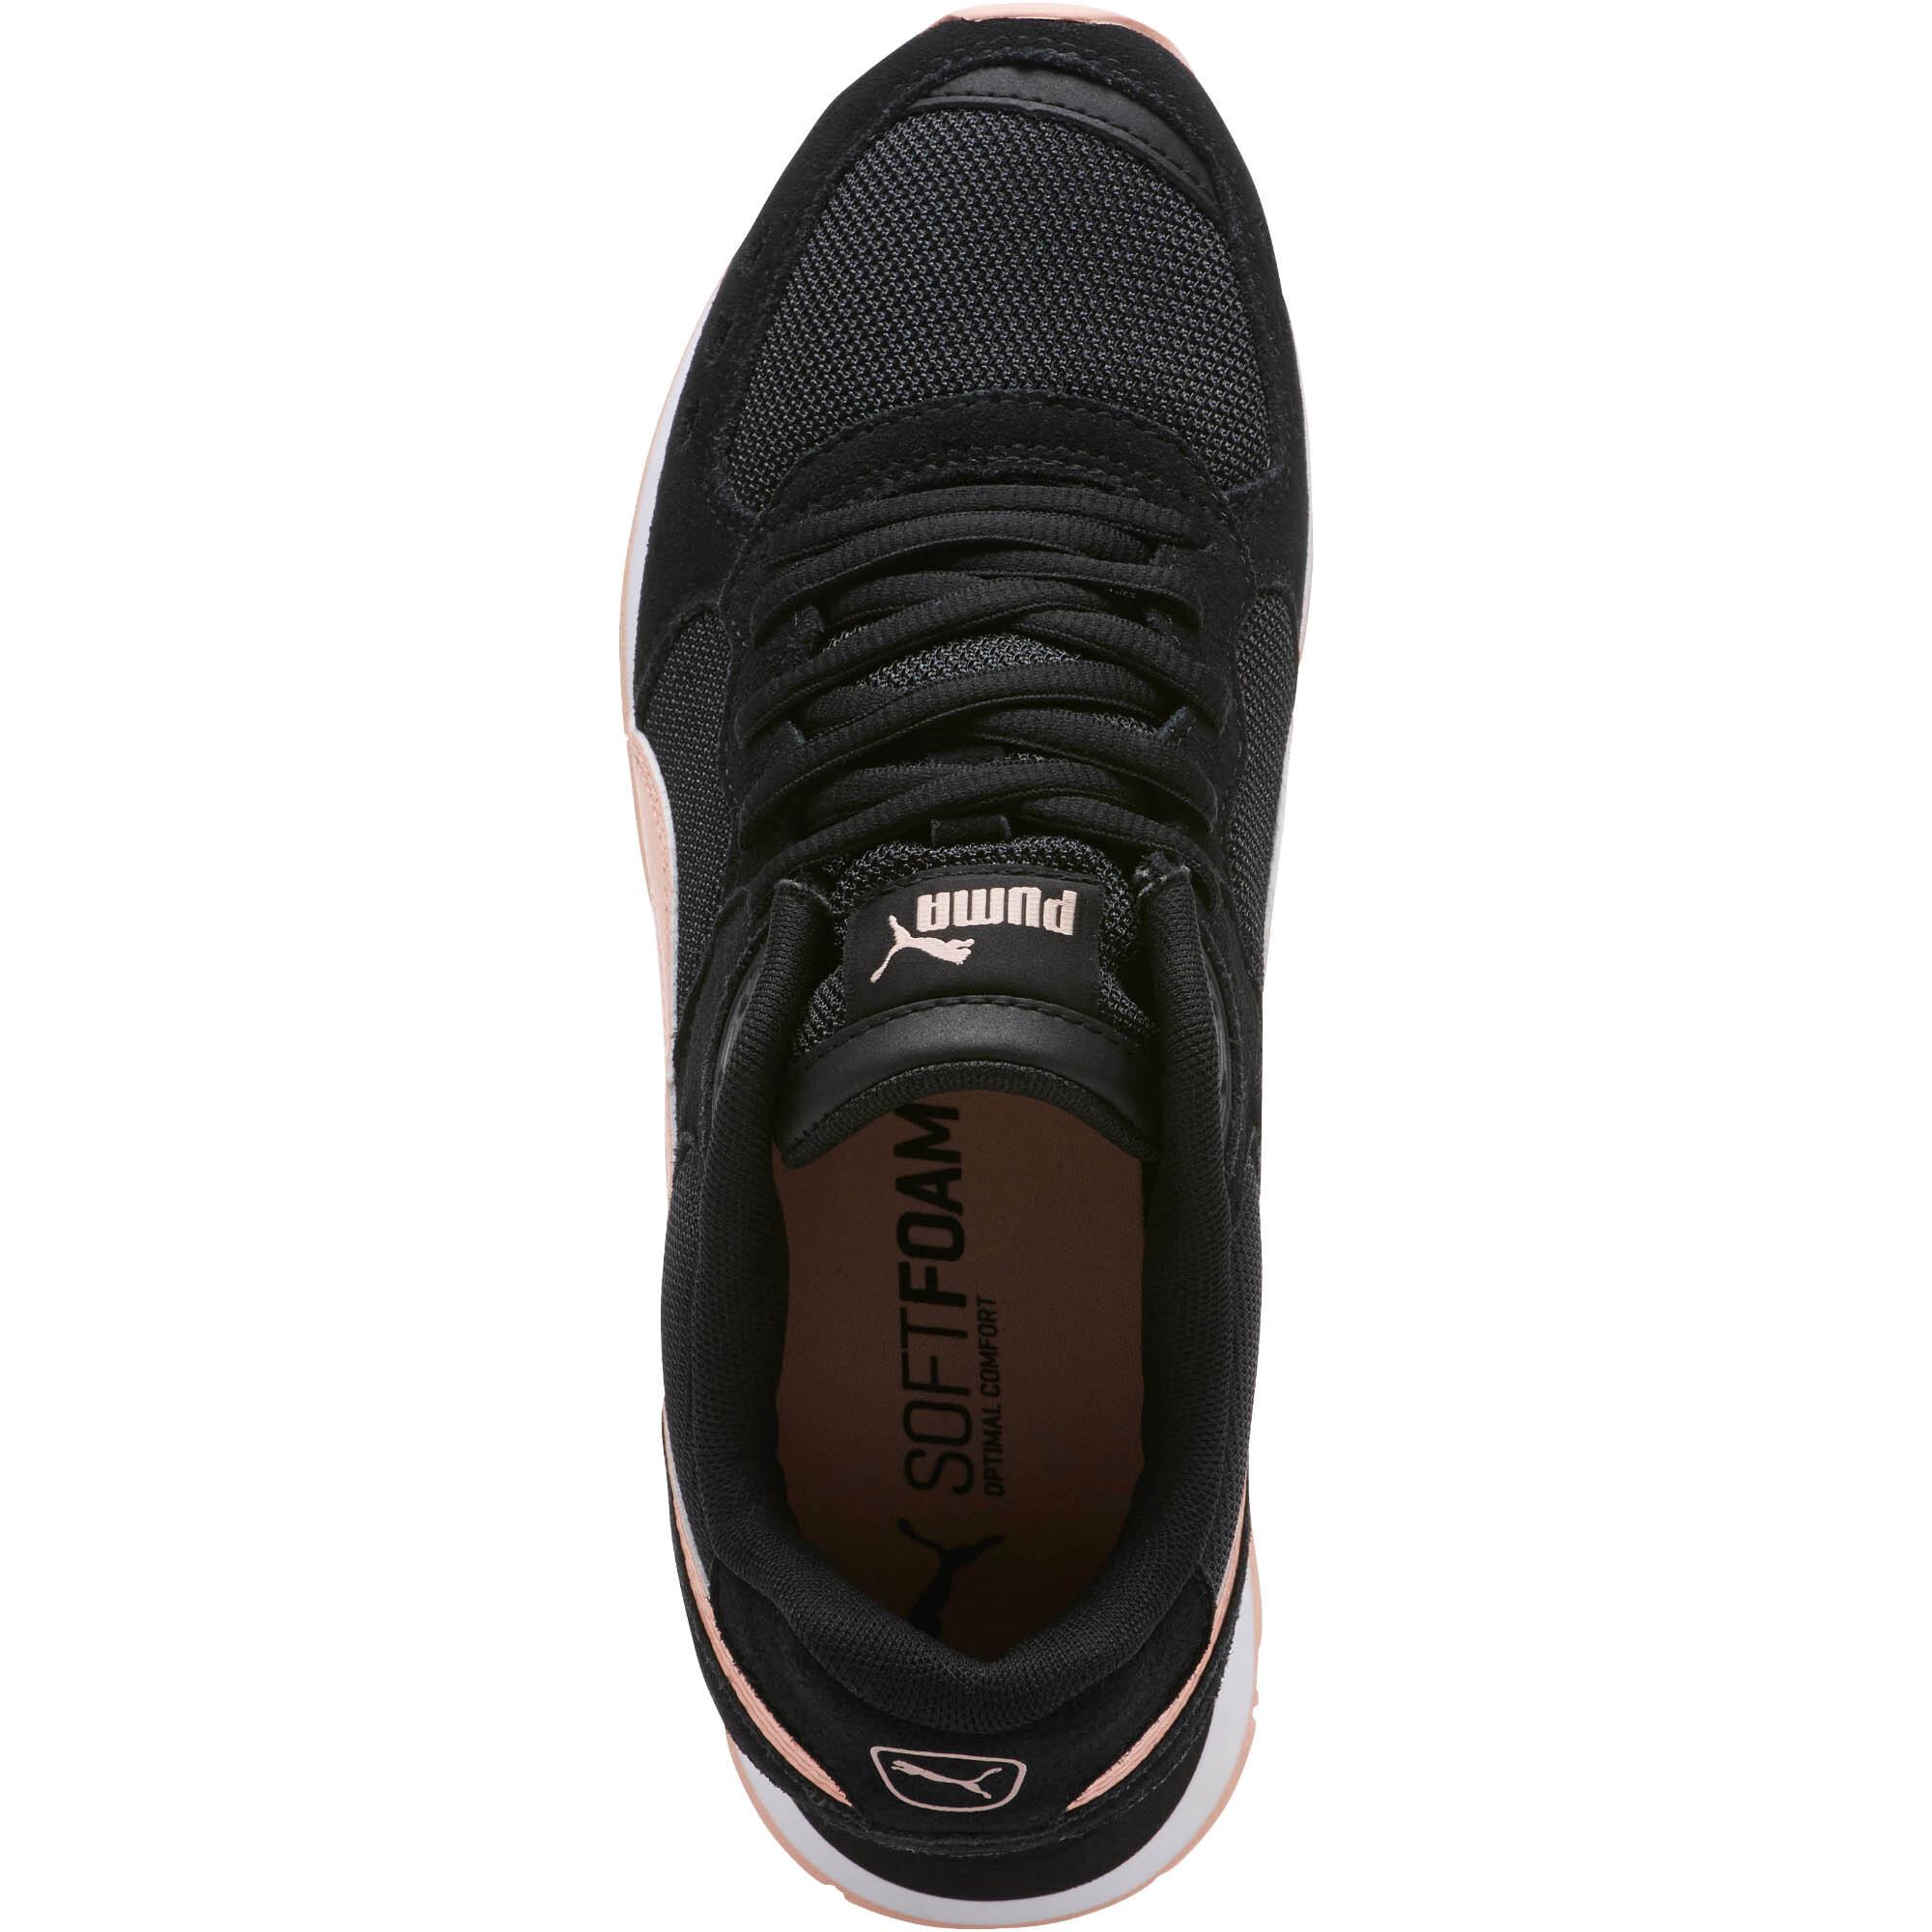 PUMA-Vista-Women-s-Sneakers-Women-Shoe-Basics thumbnail 11